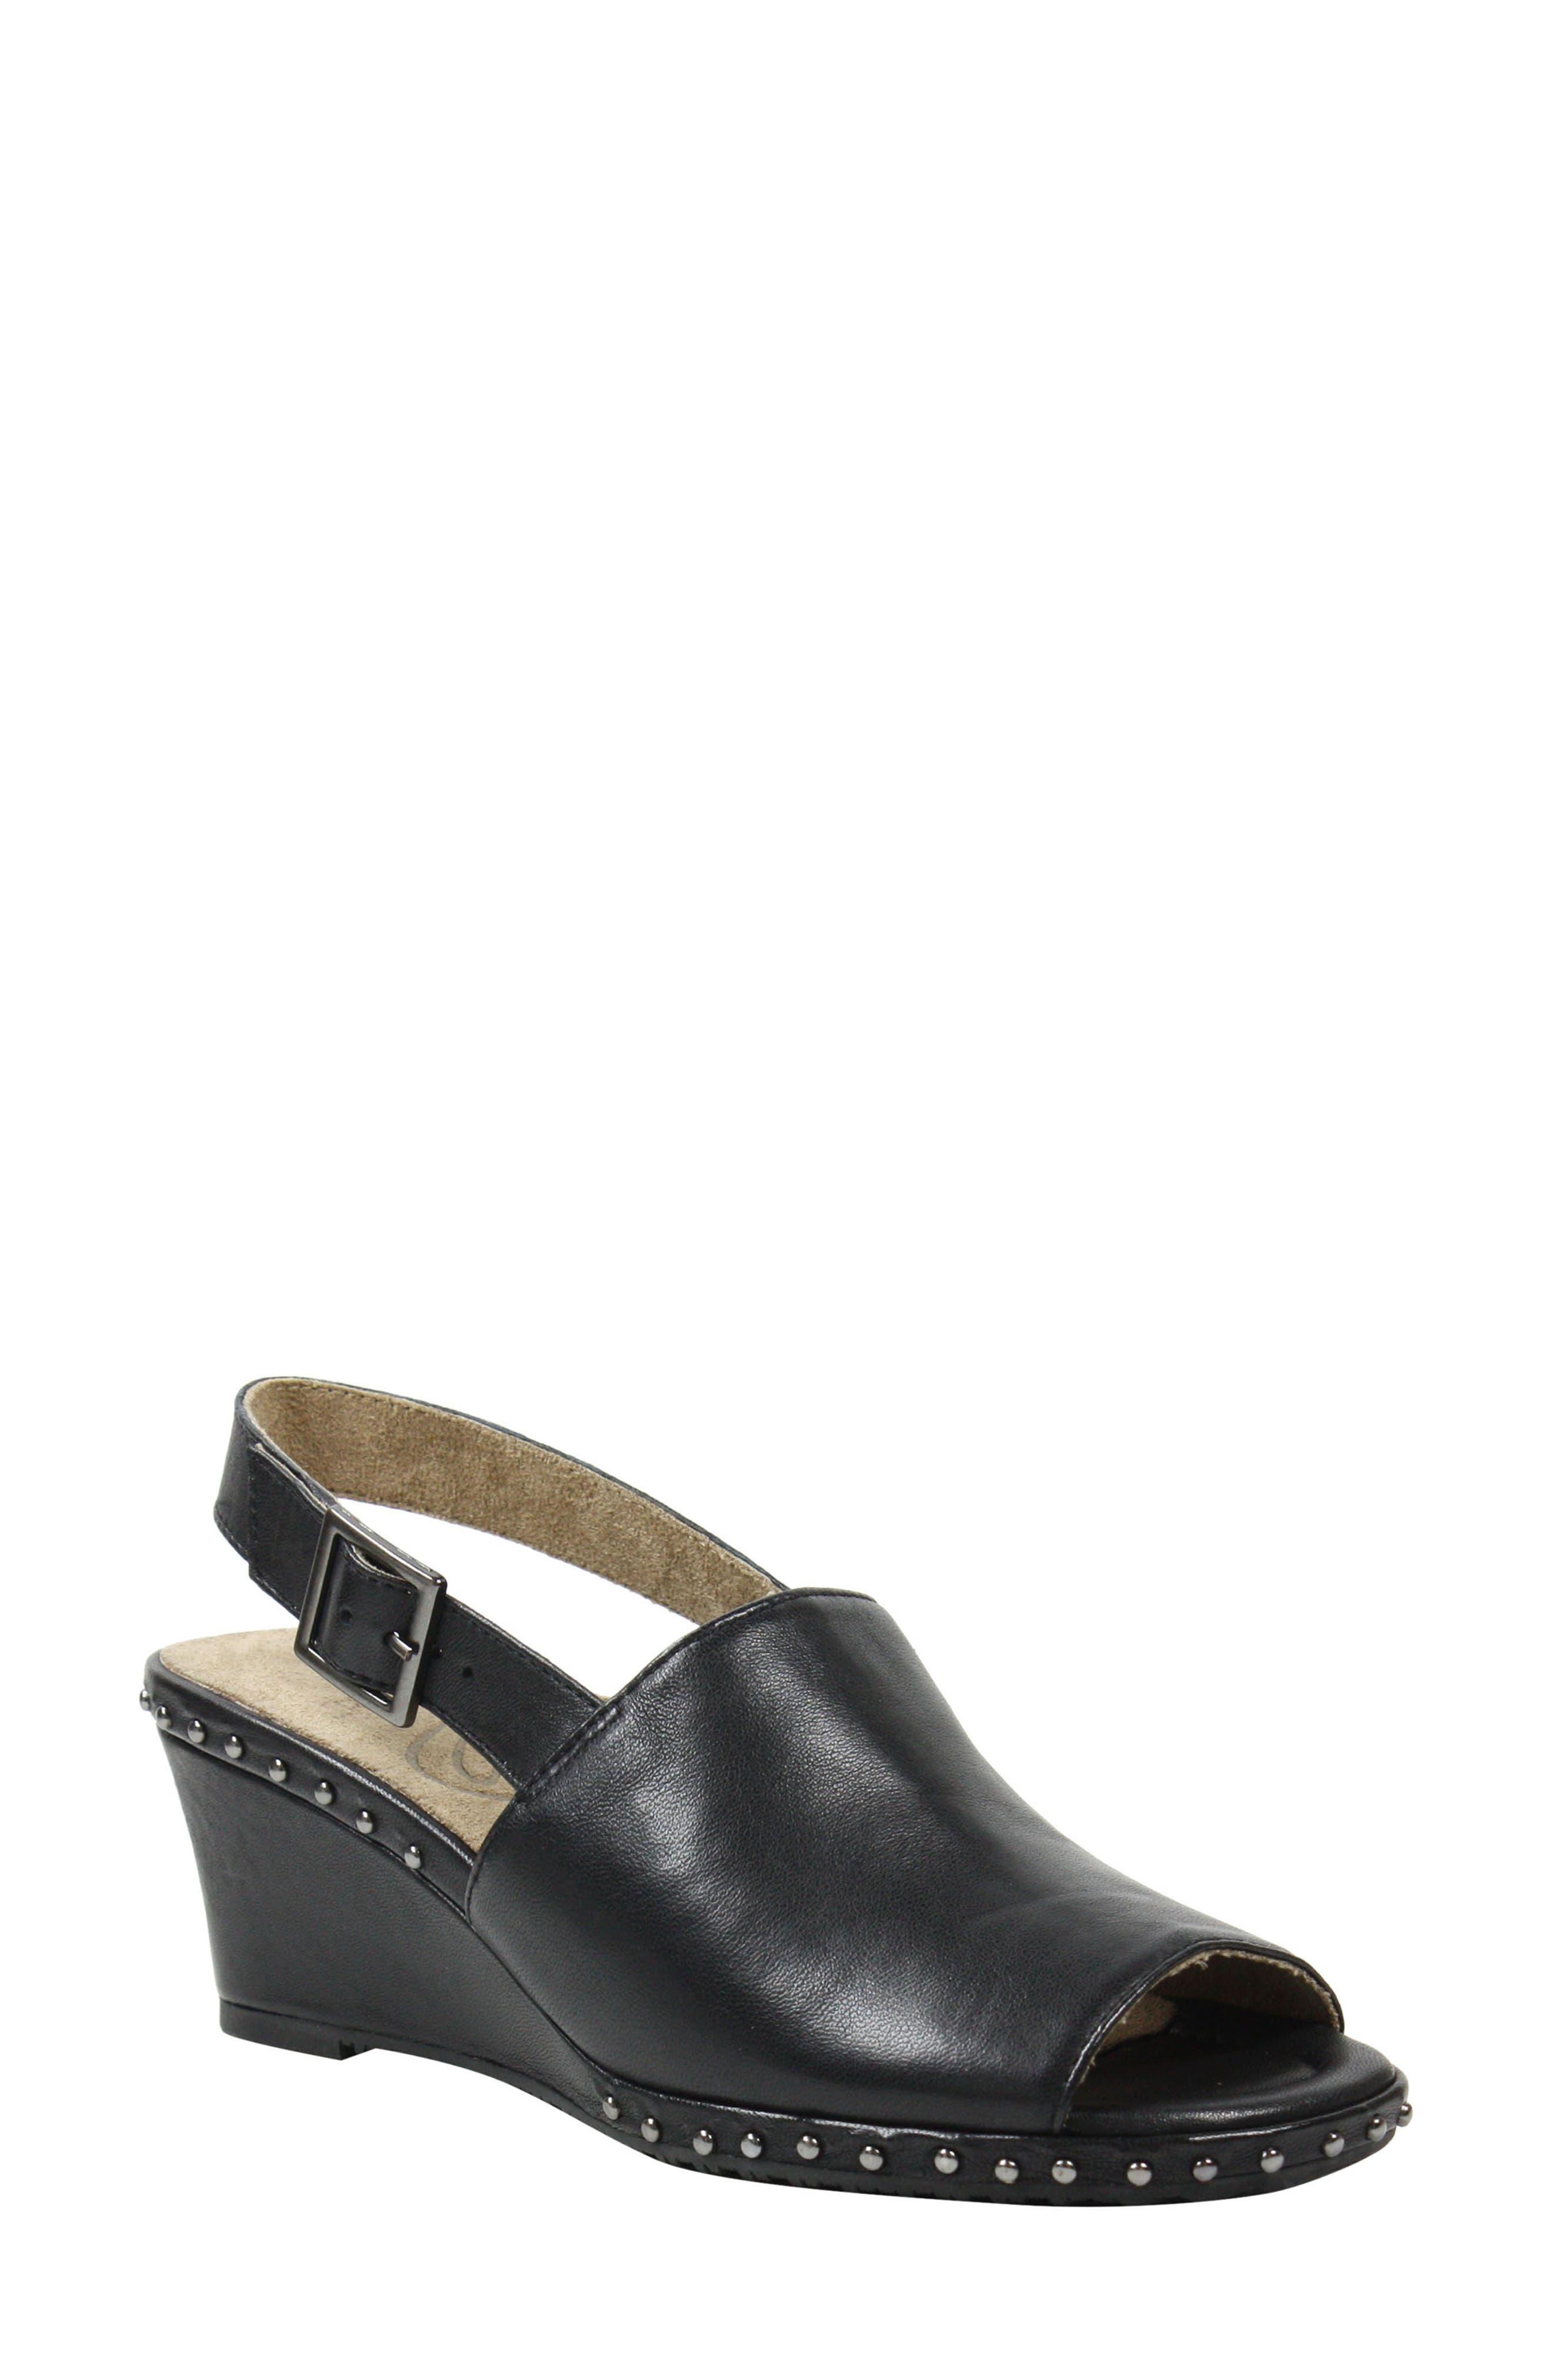 Antandra Wedge Sandal, Main, color, BLACK LEATHER